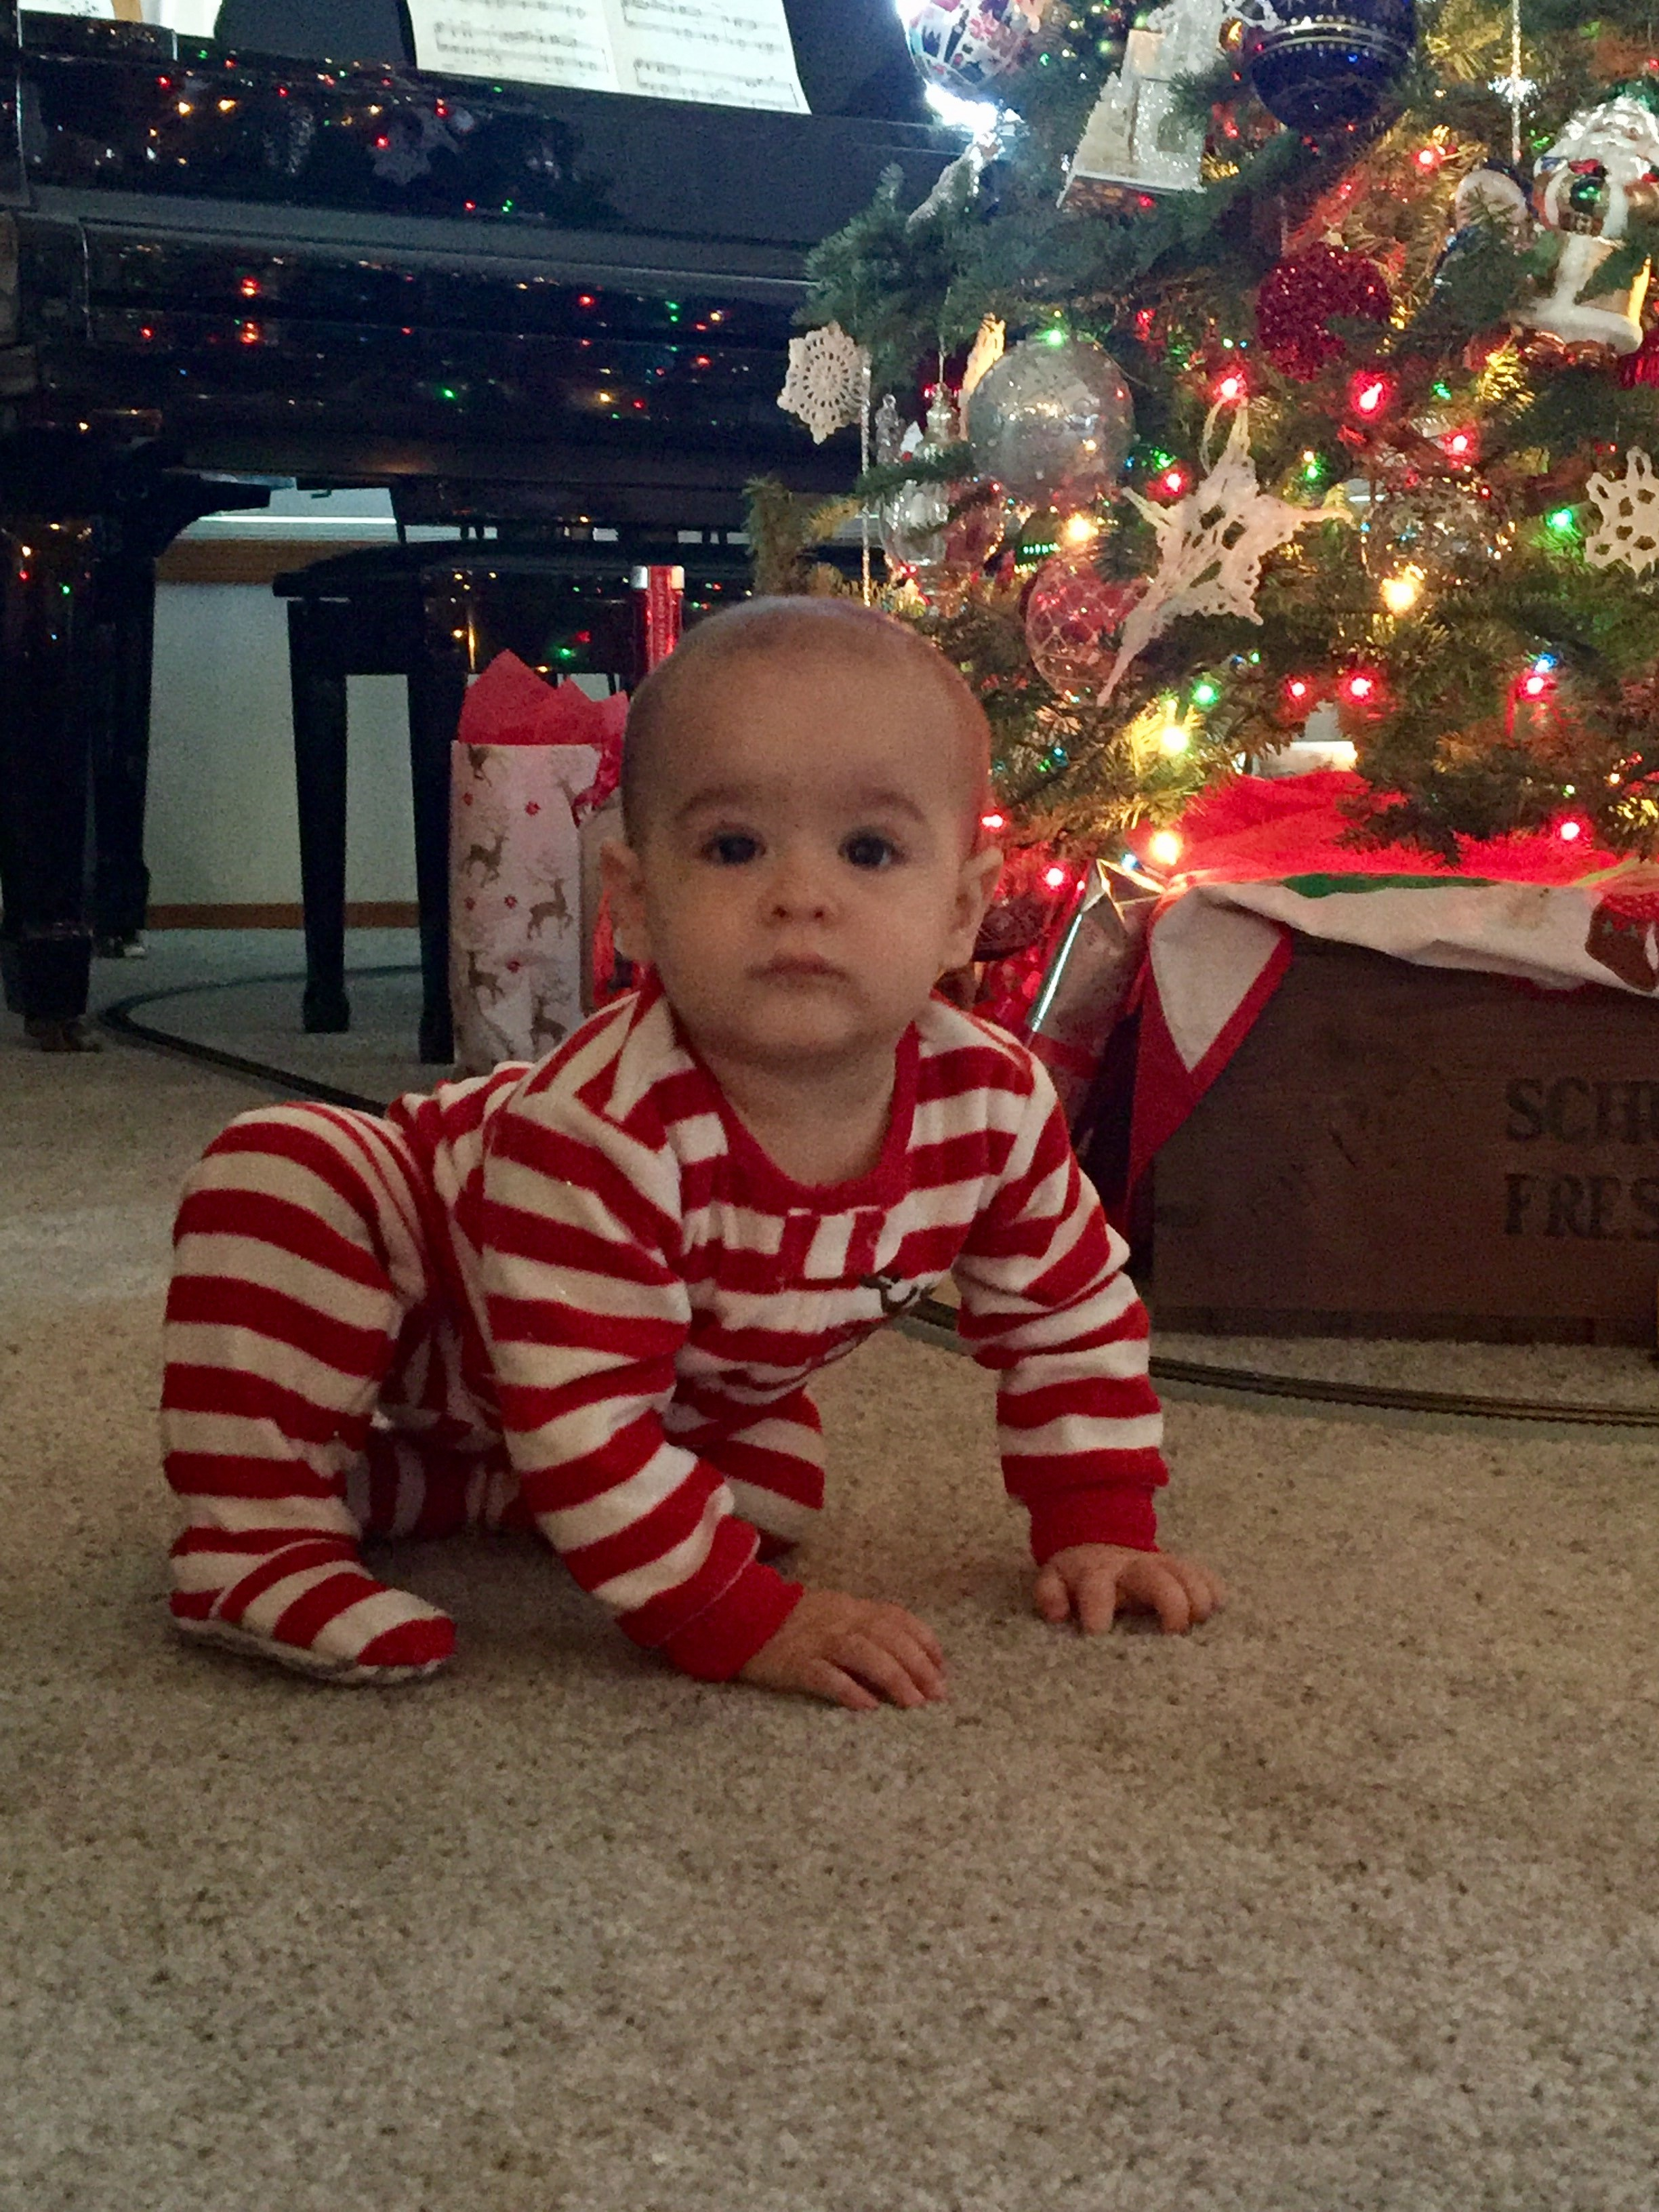 Cute Kids on Christmas